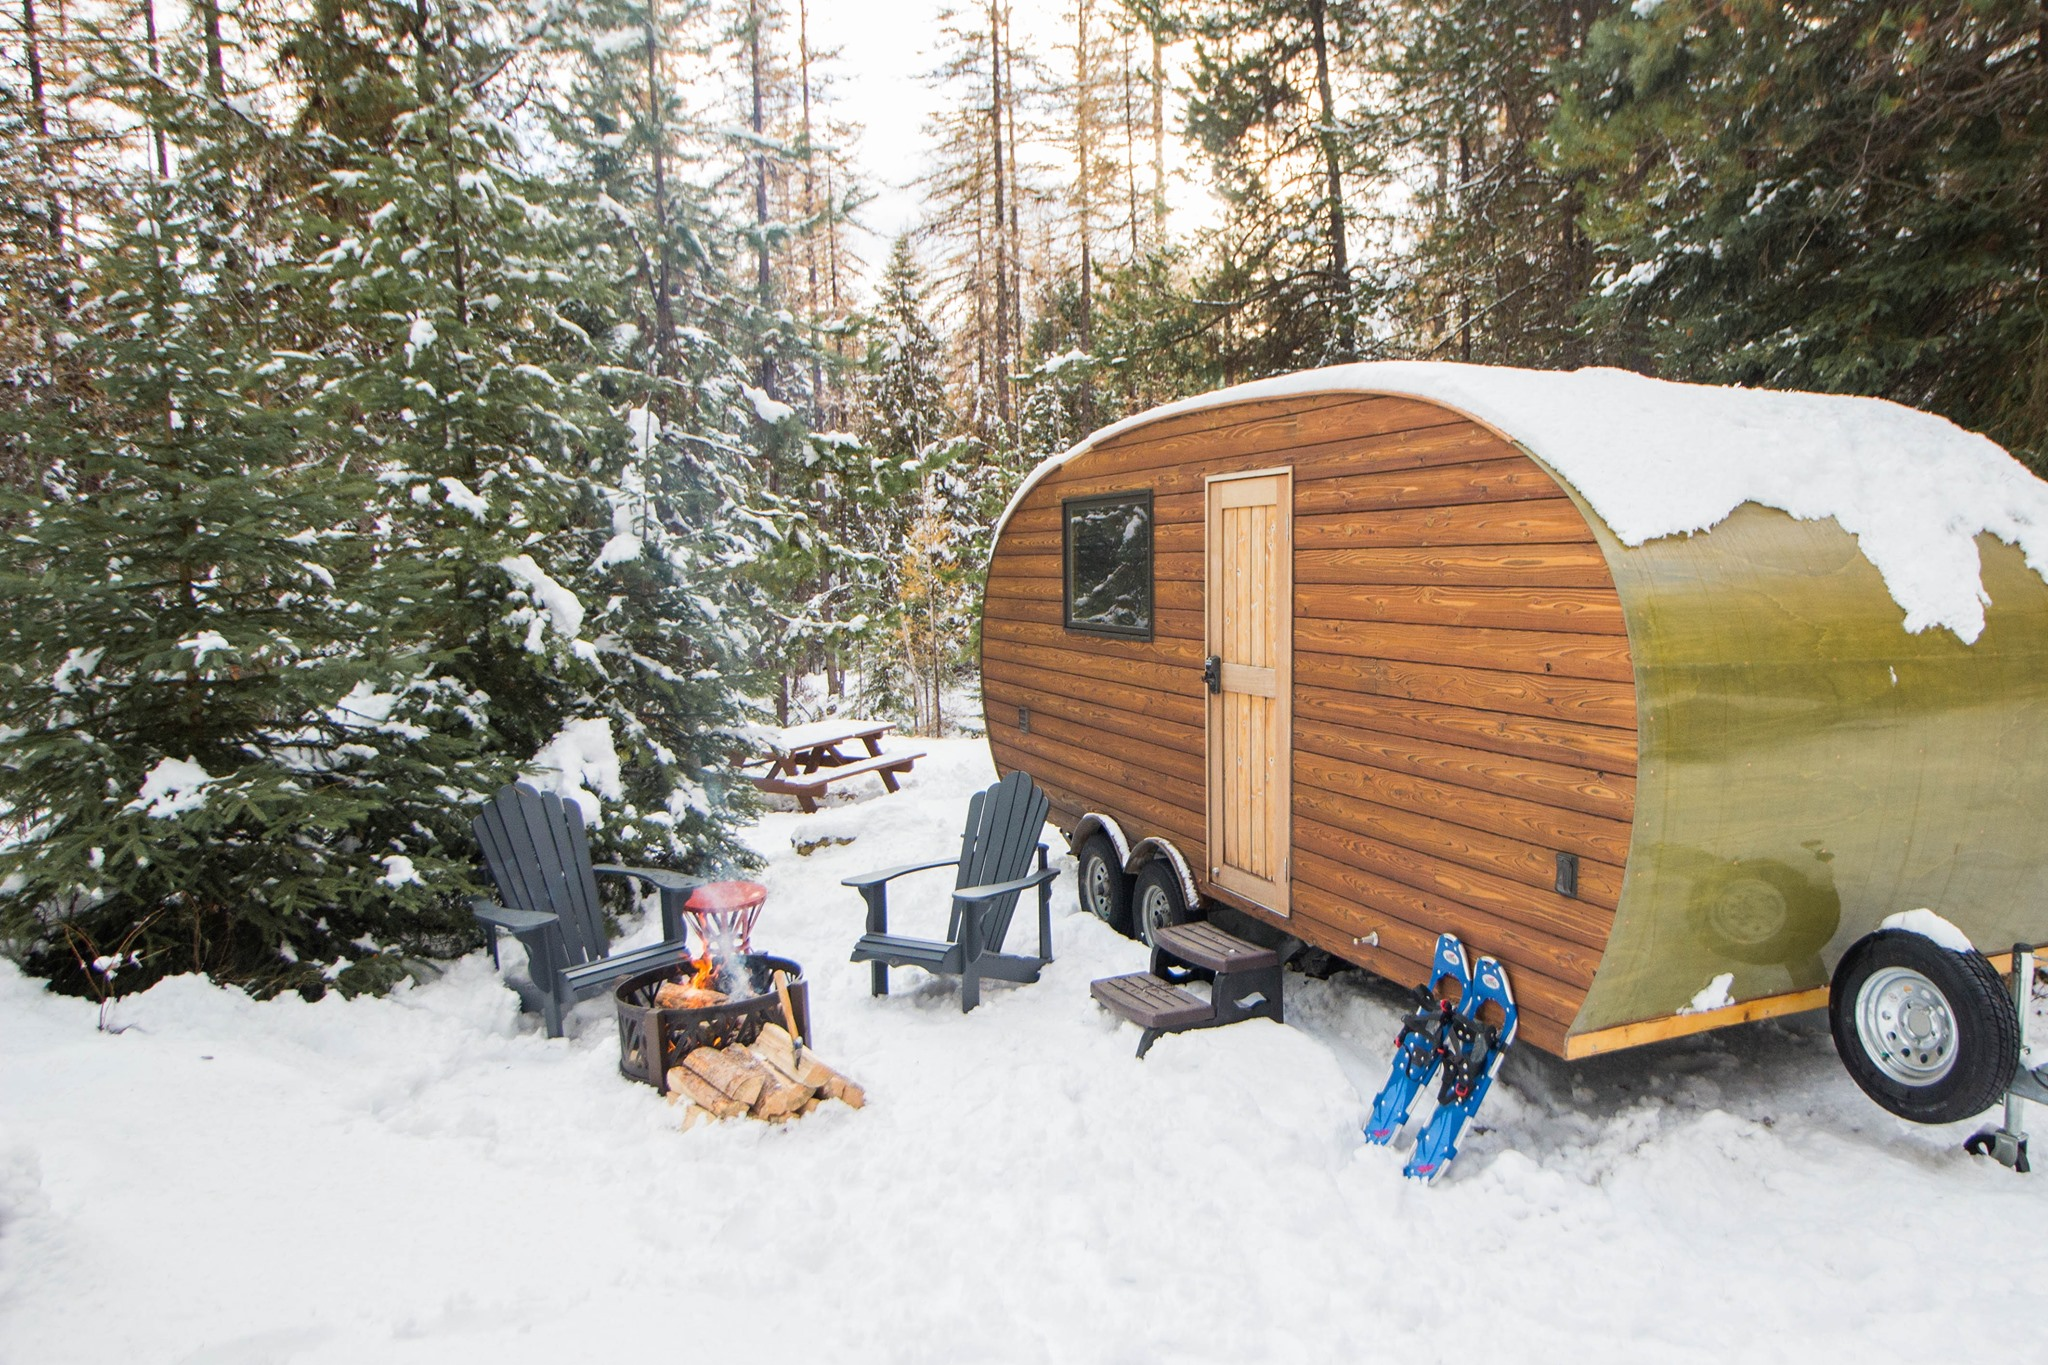 Enjoy Winter Wonderland Glamping At Its Finest At Roam Beyond In Montana